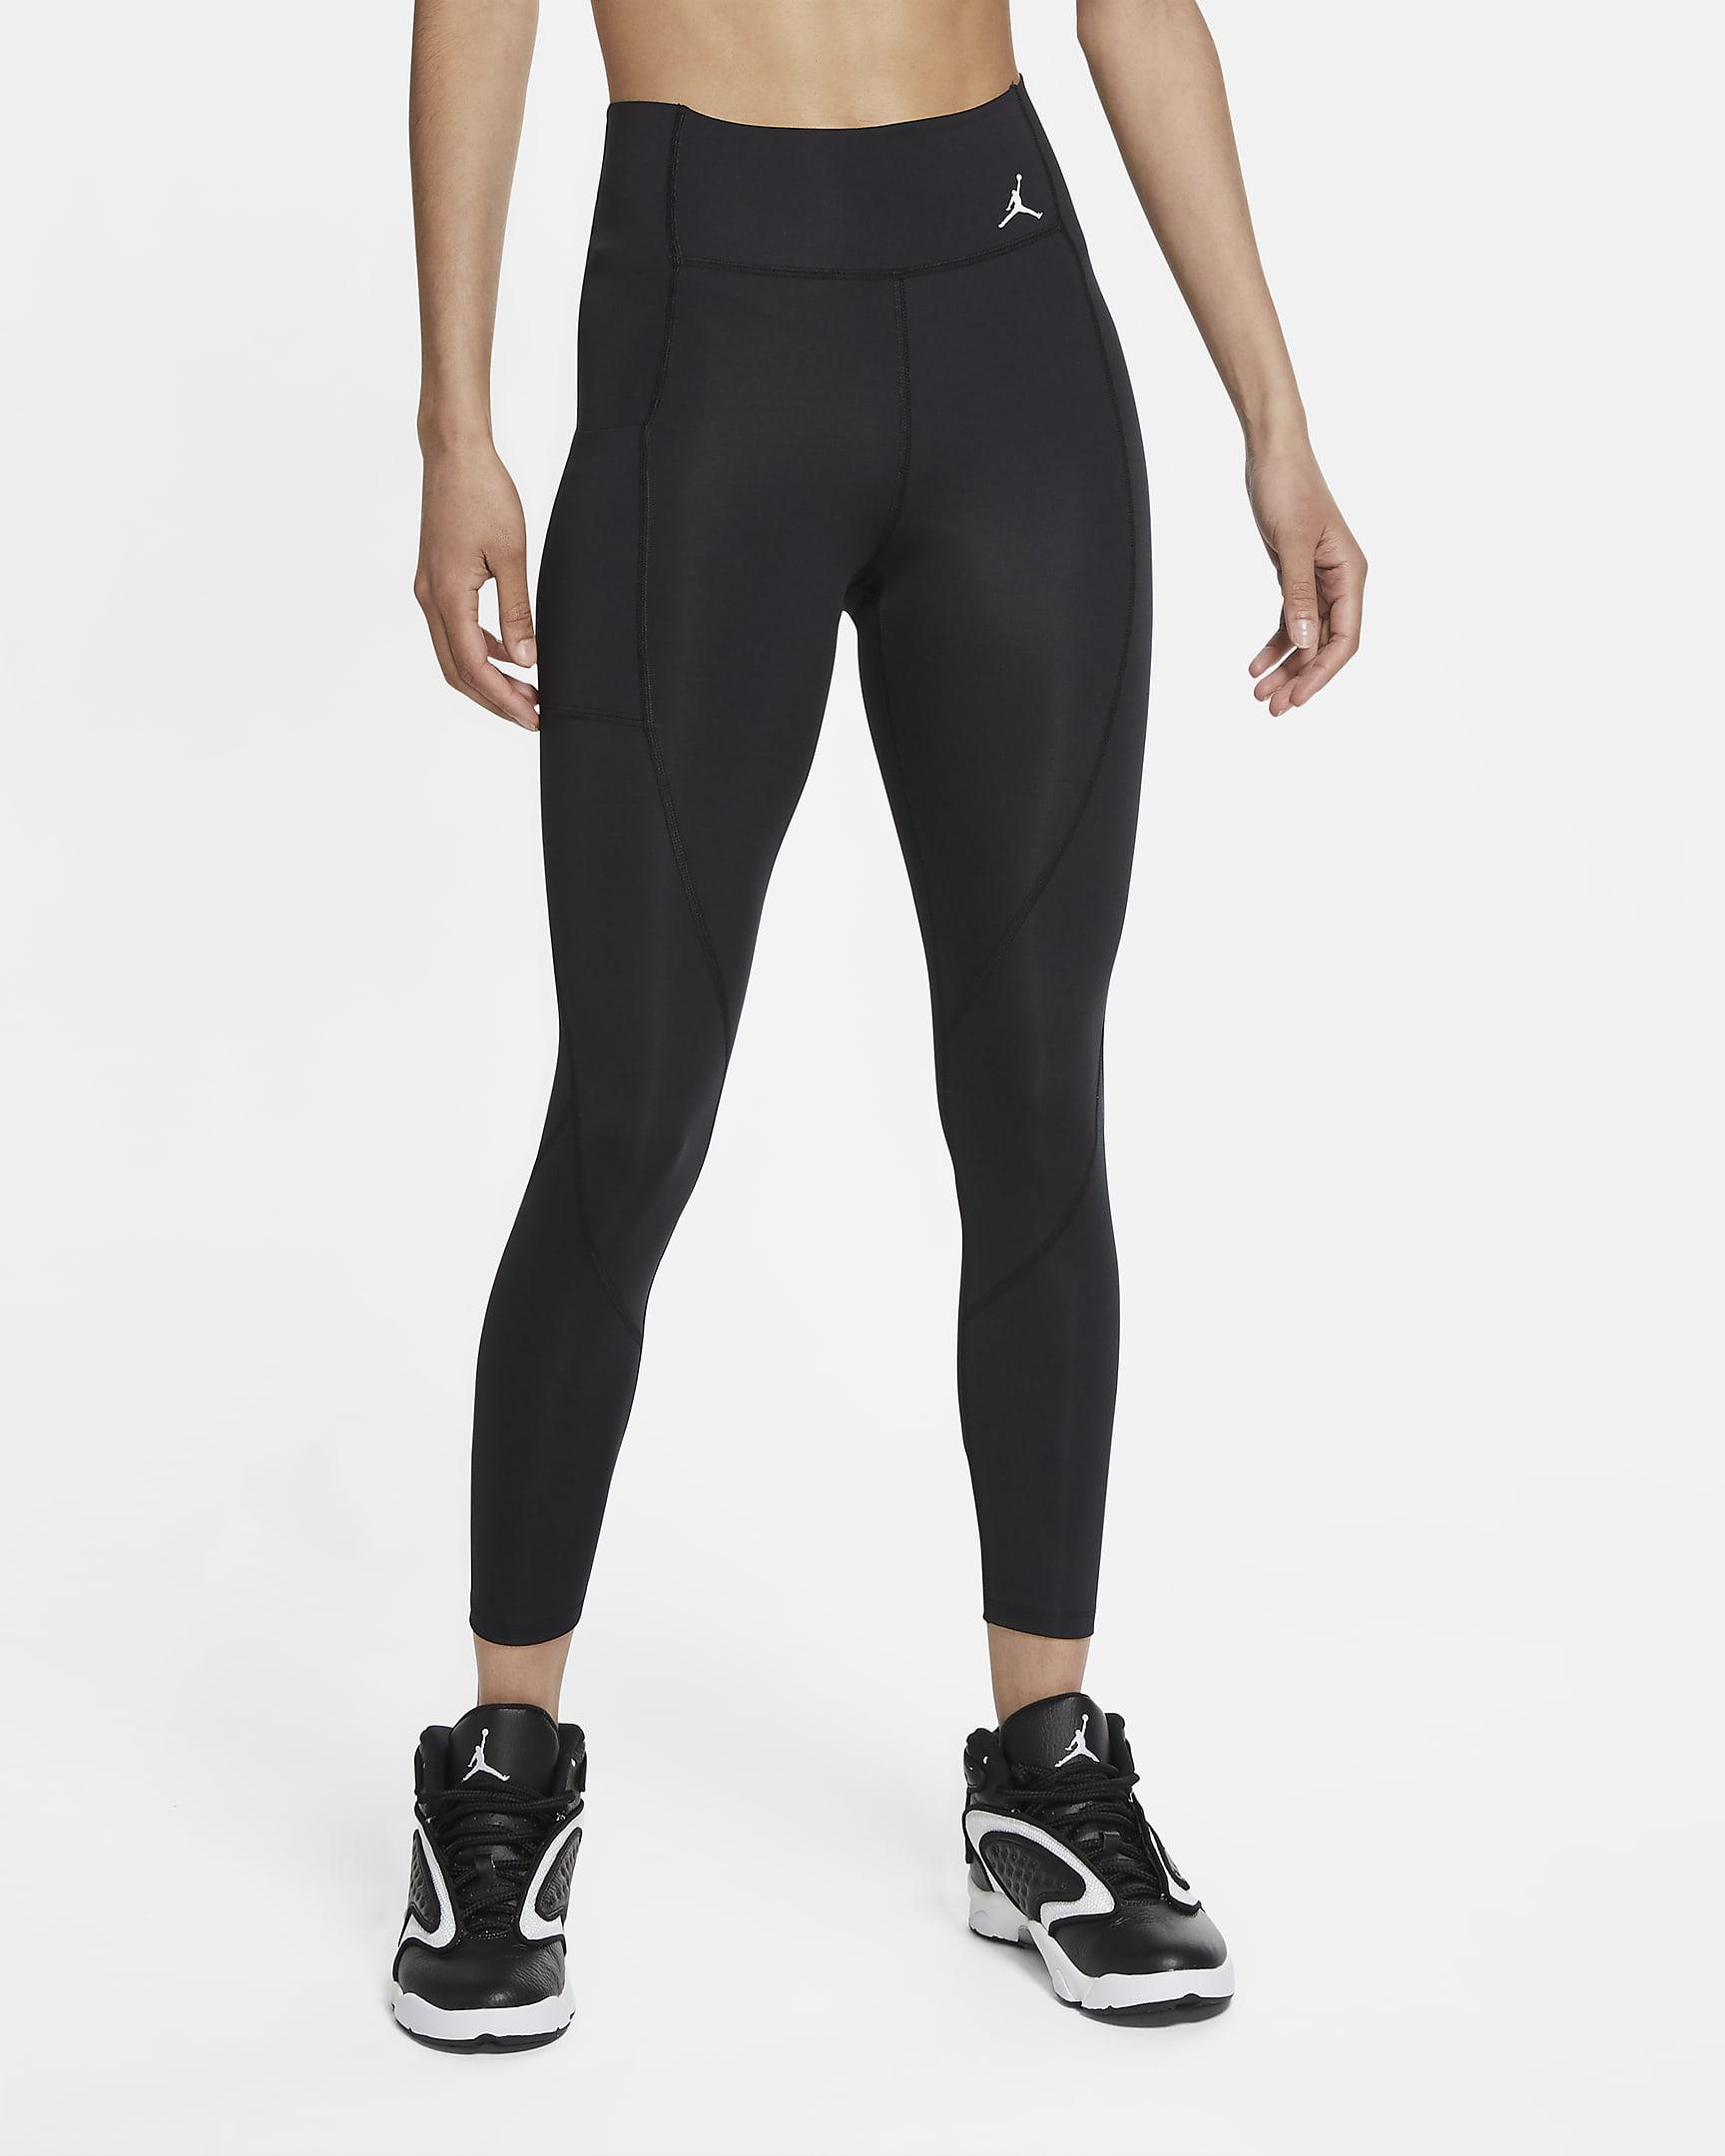 jordan-essentials-womens-mid-rise-7-8-leggings-N3lDkx.png